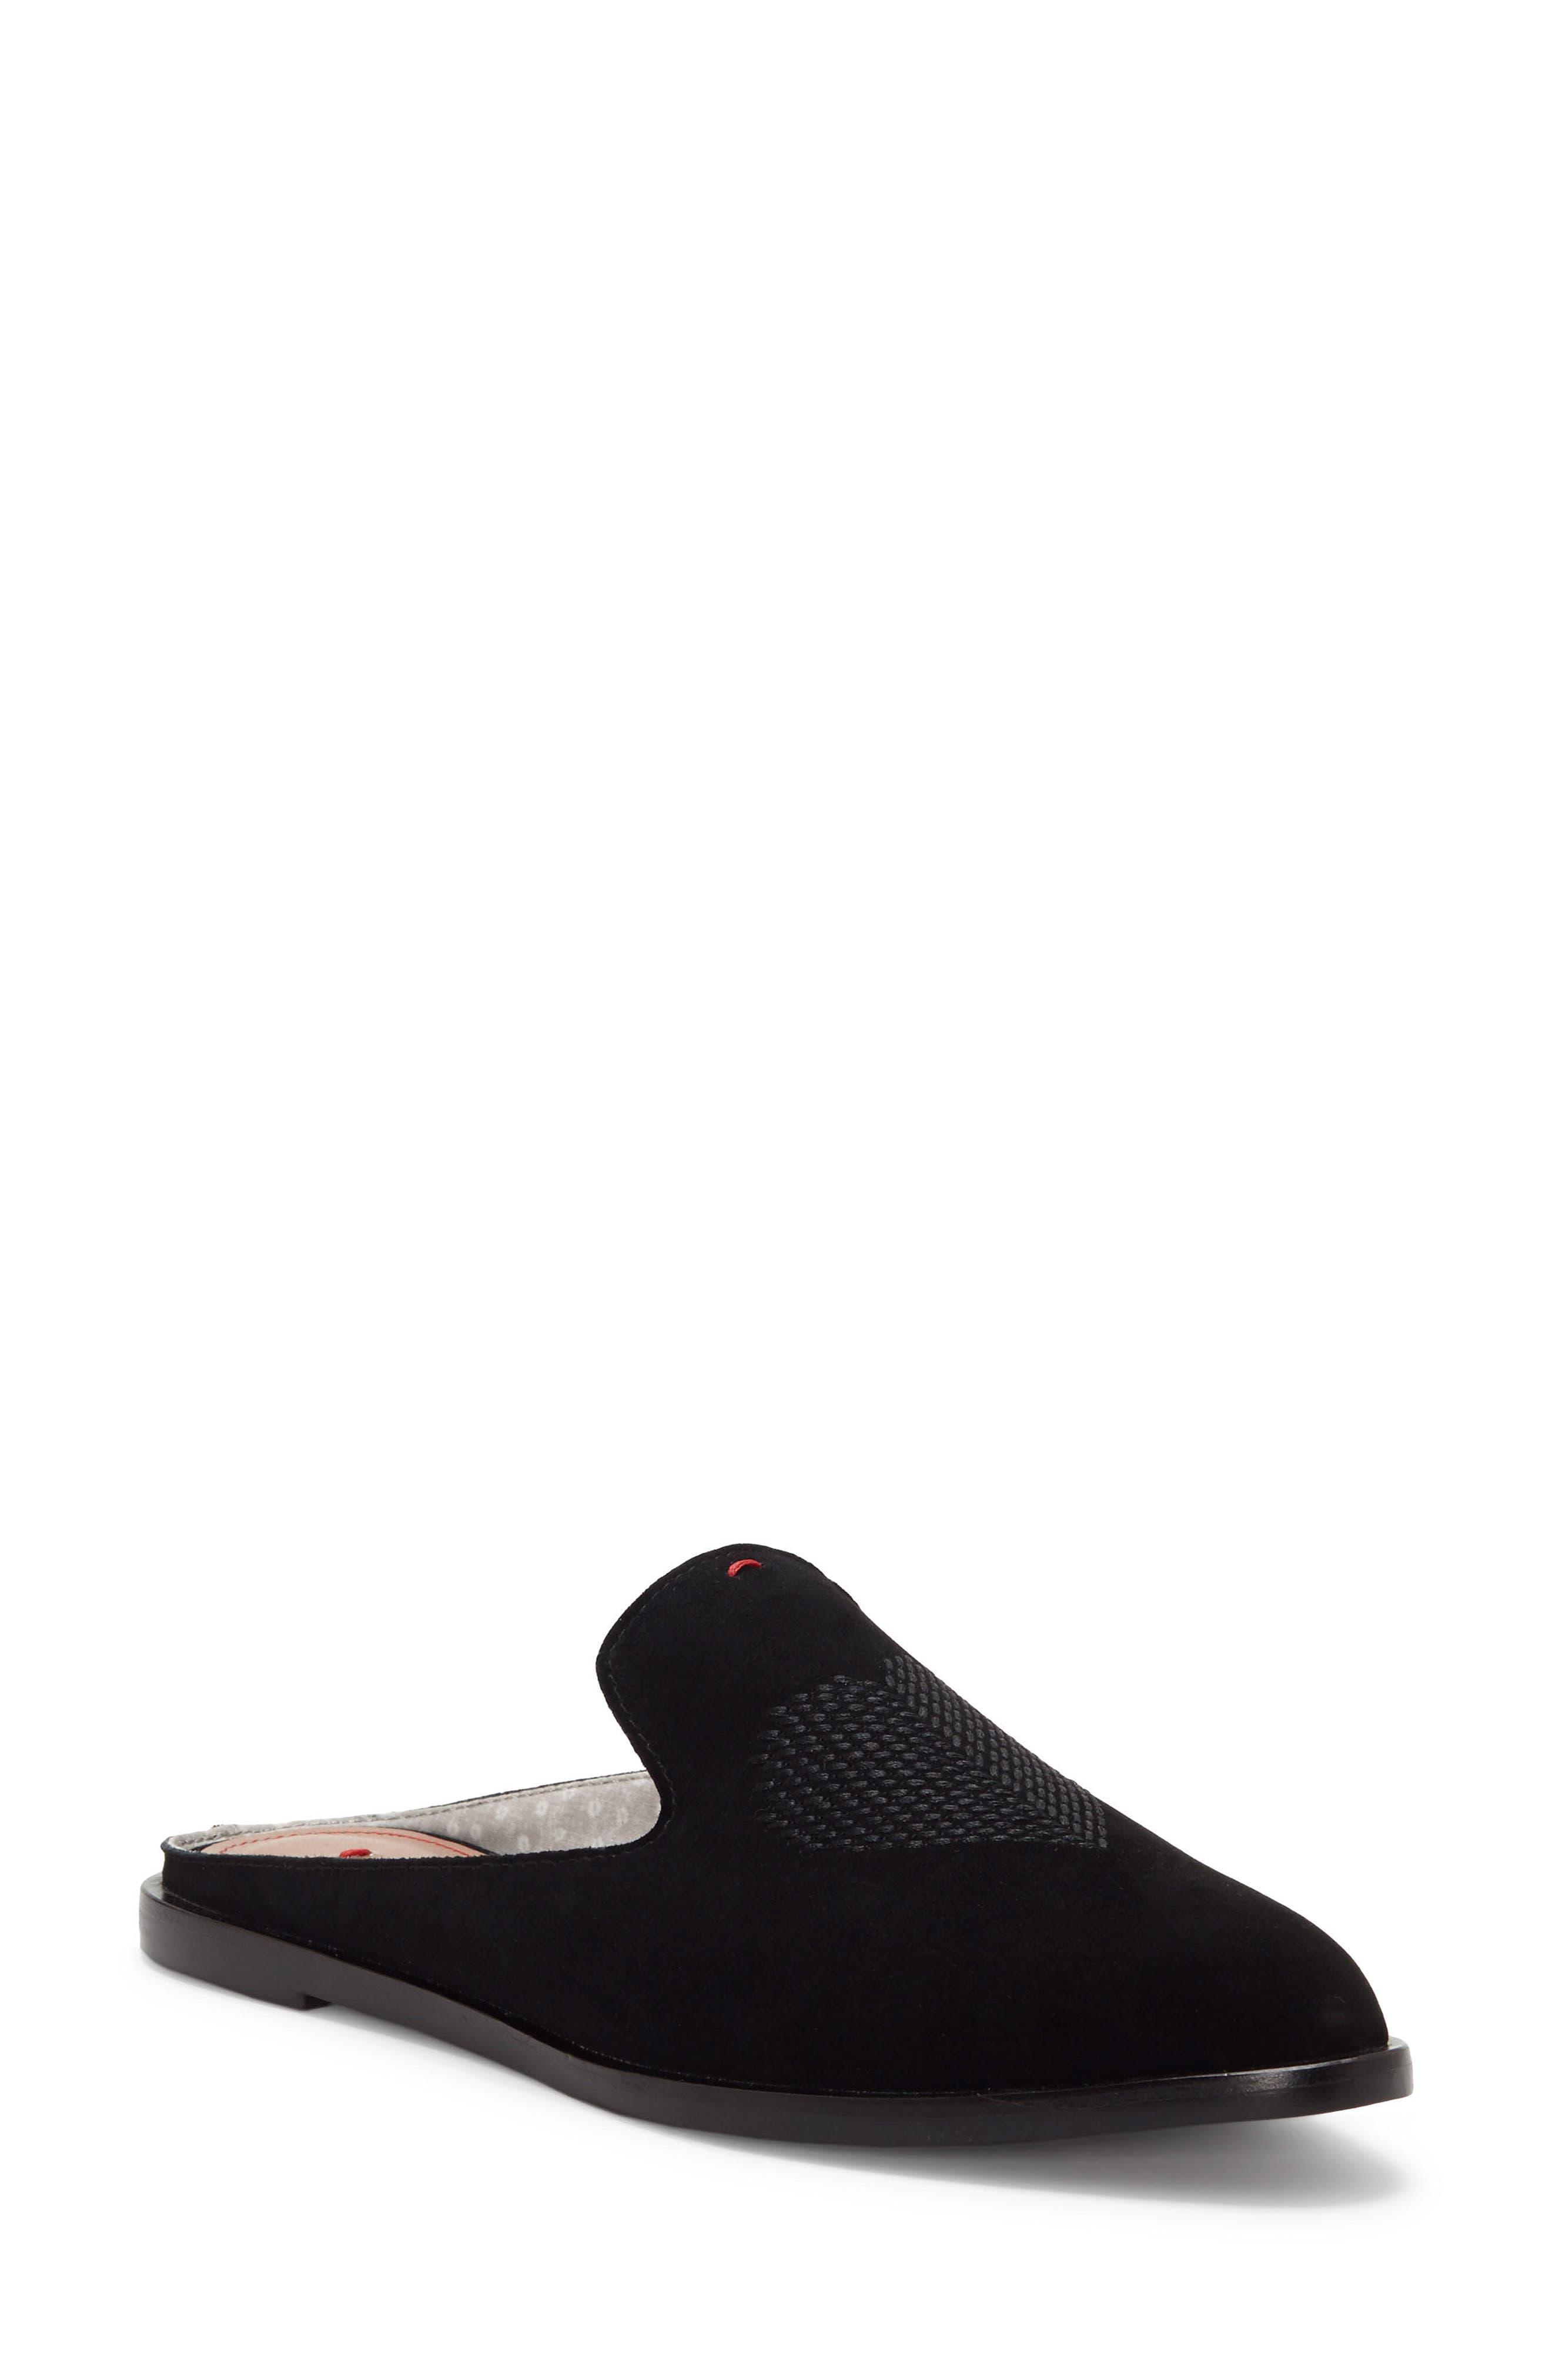 Klyde Mule,                         Main,                         color, Black Suede